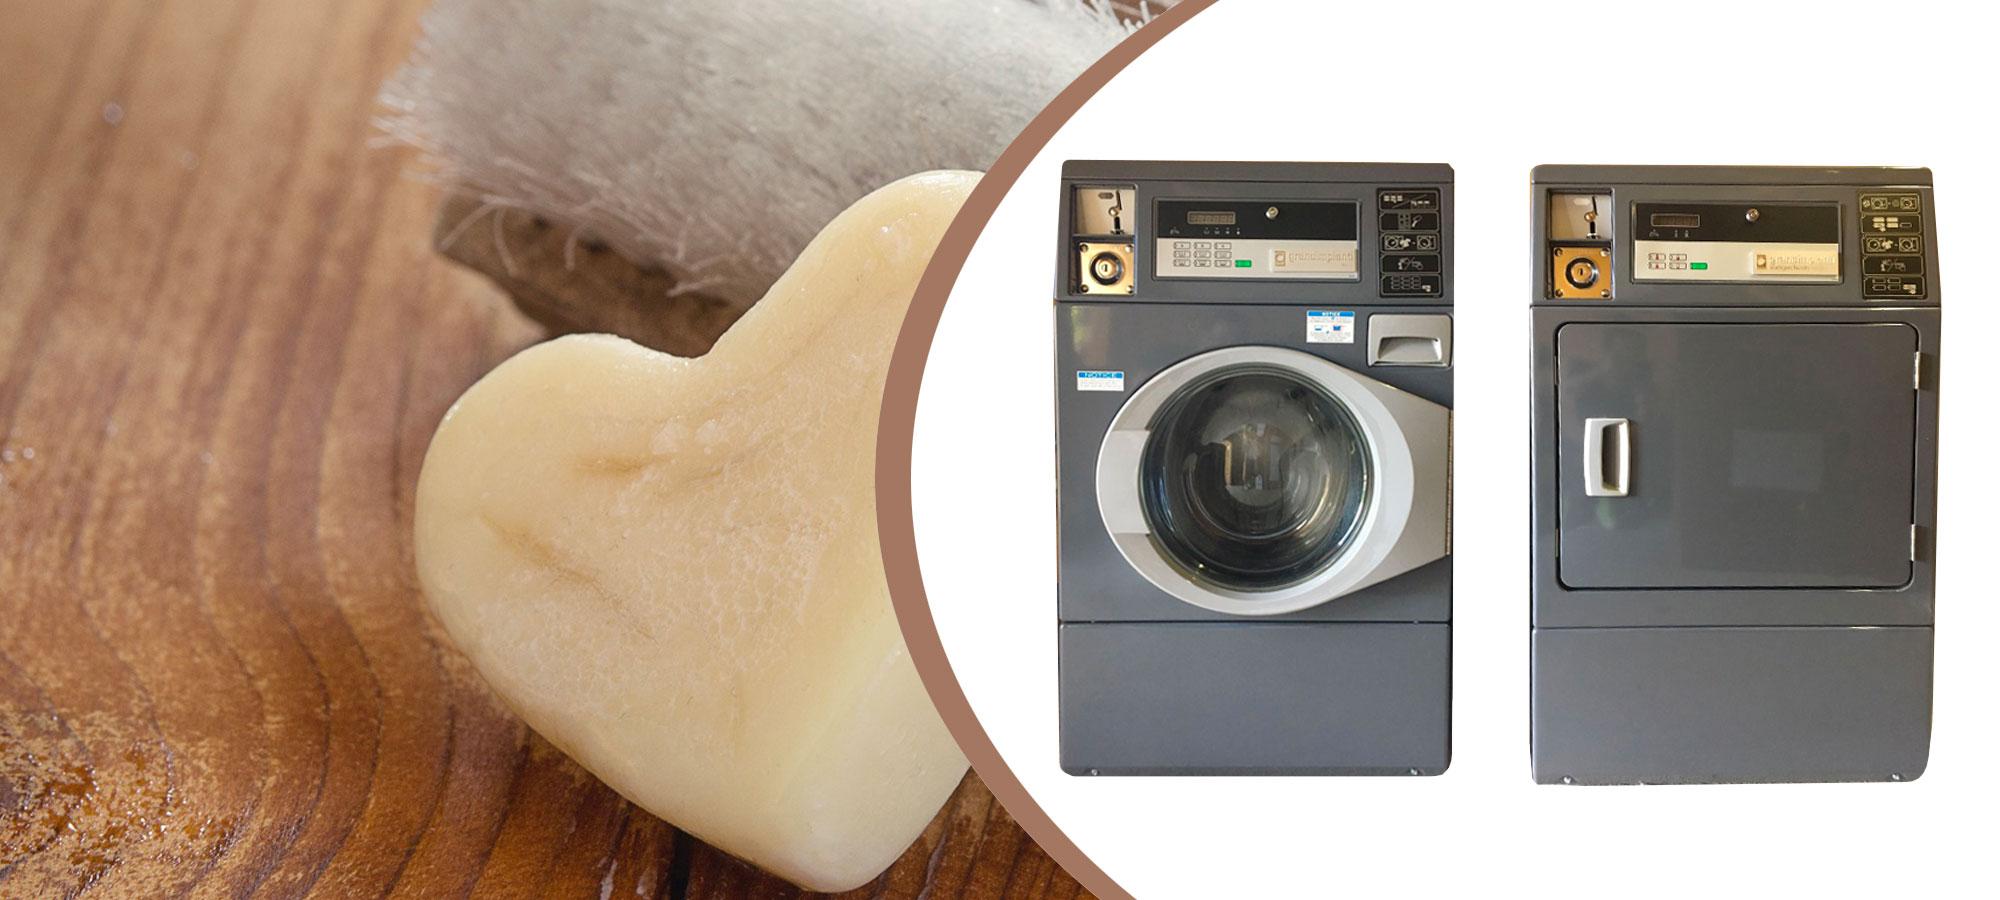 Lavasciuga comodissima